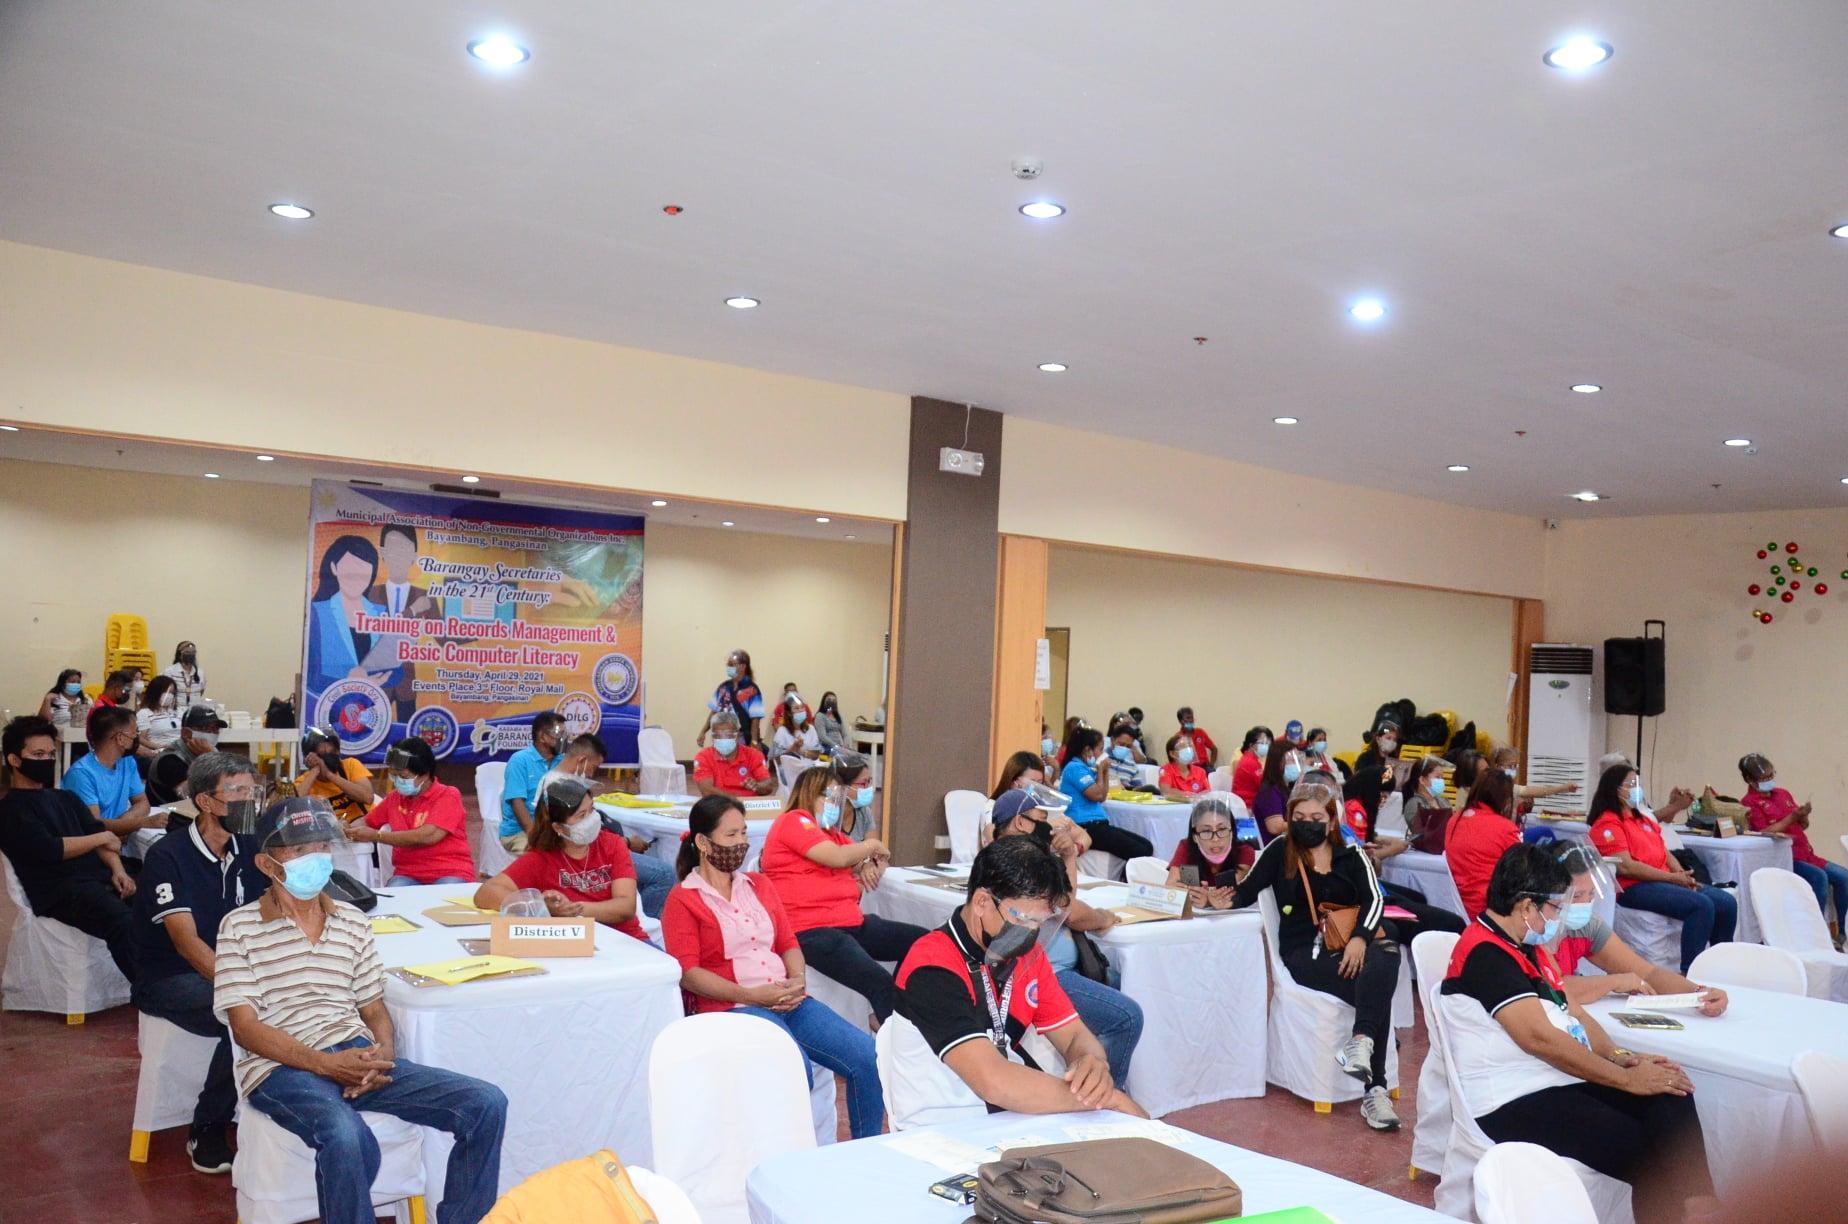 Barangay Secretaries' Training on Records Management and Basic Computer Literacy